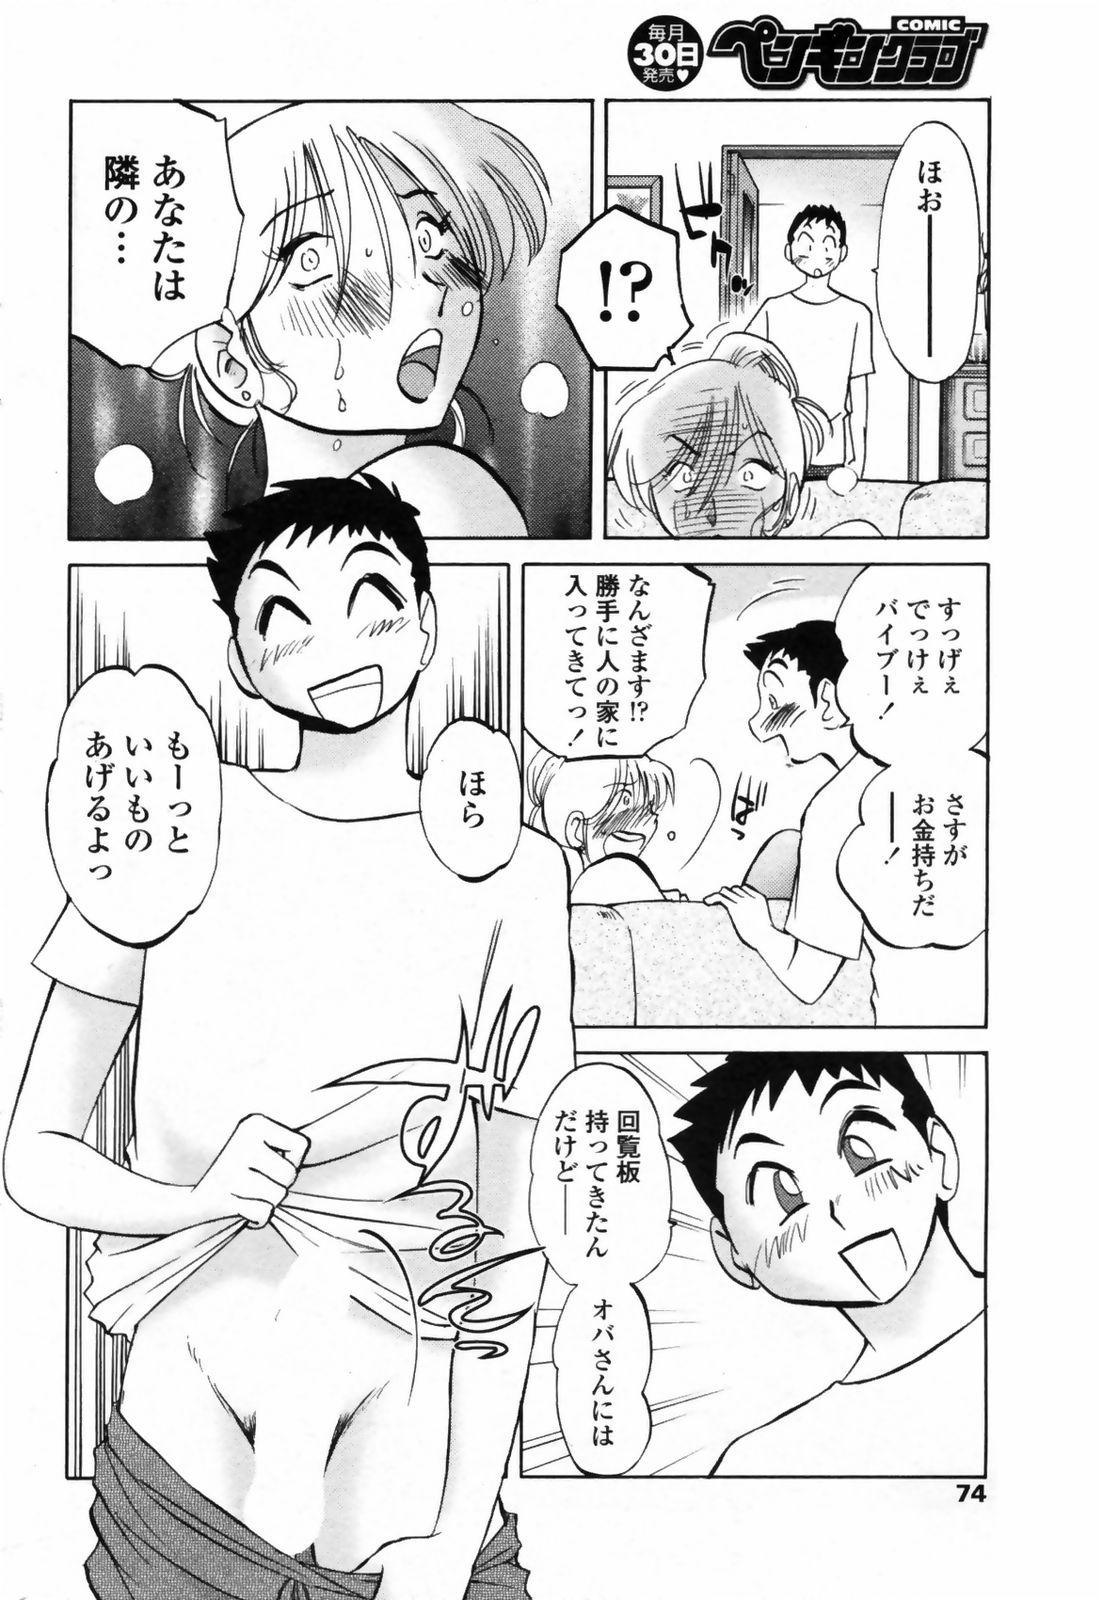 [Tsuyatsuya] Azumi-kun to Issho chapt.1-5 (Comic Penguin Club) 52